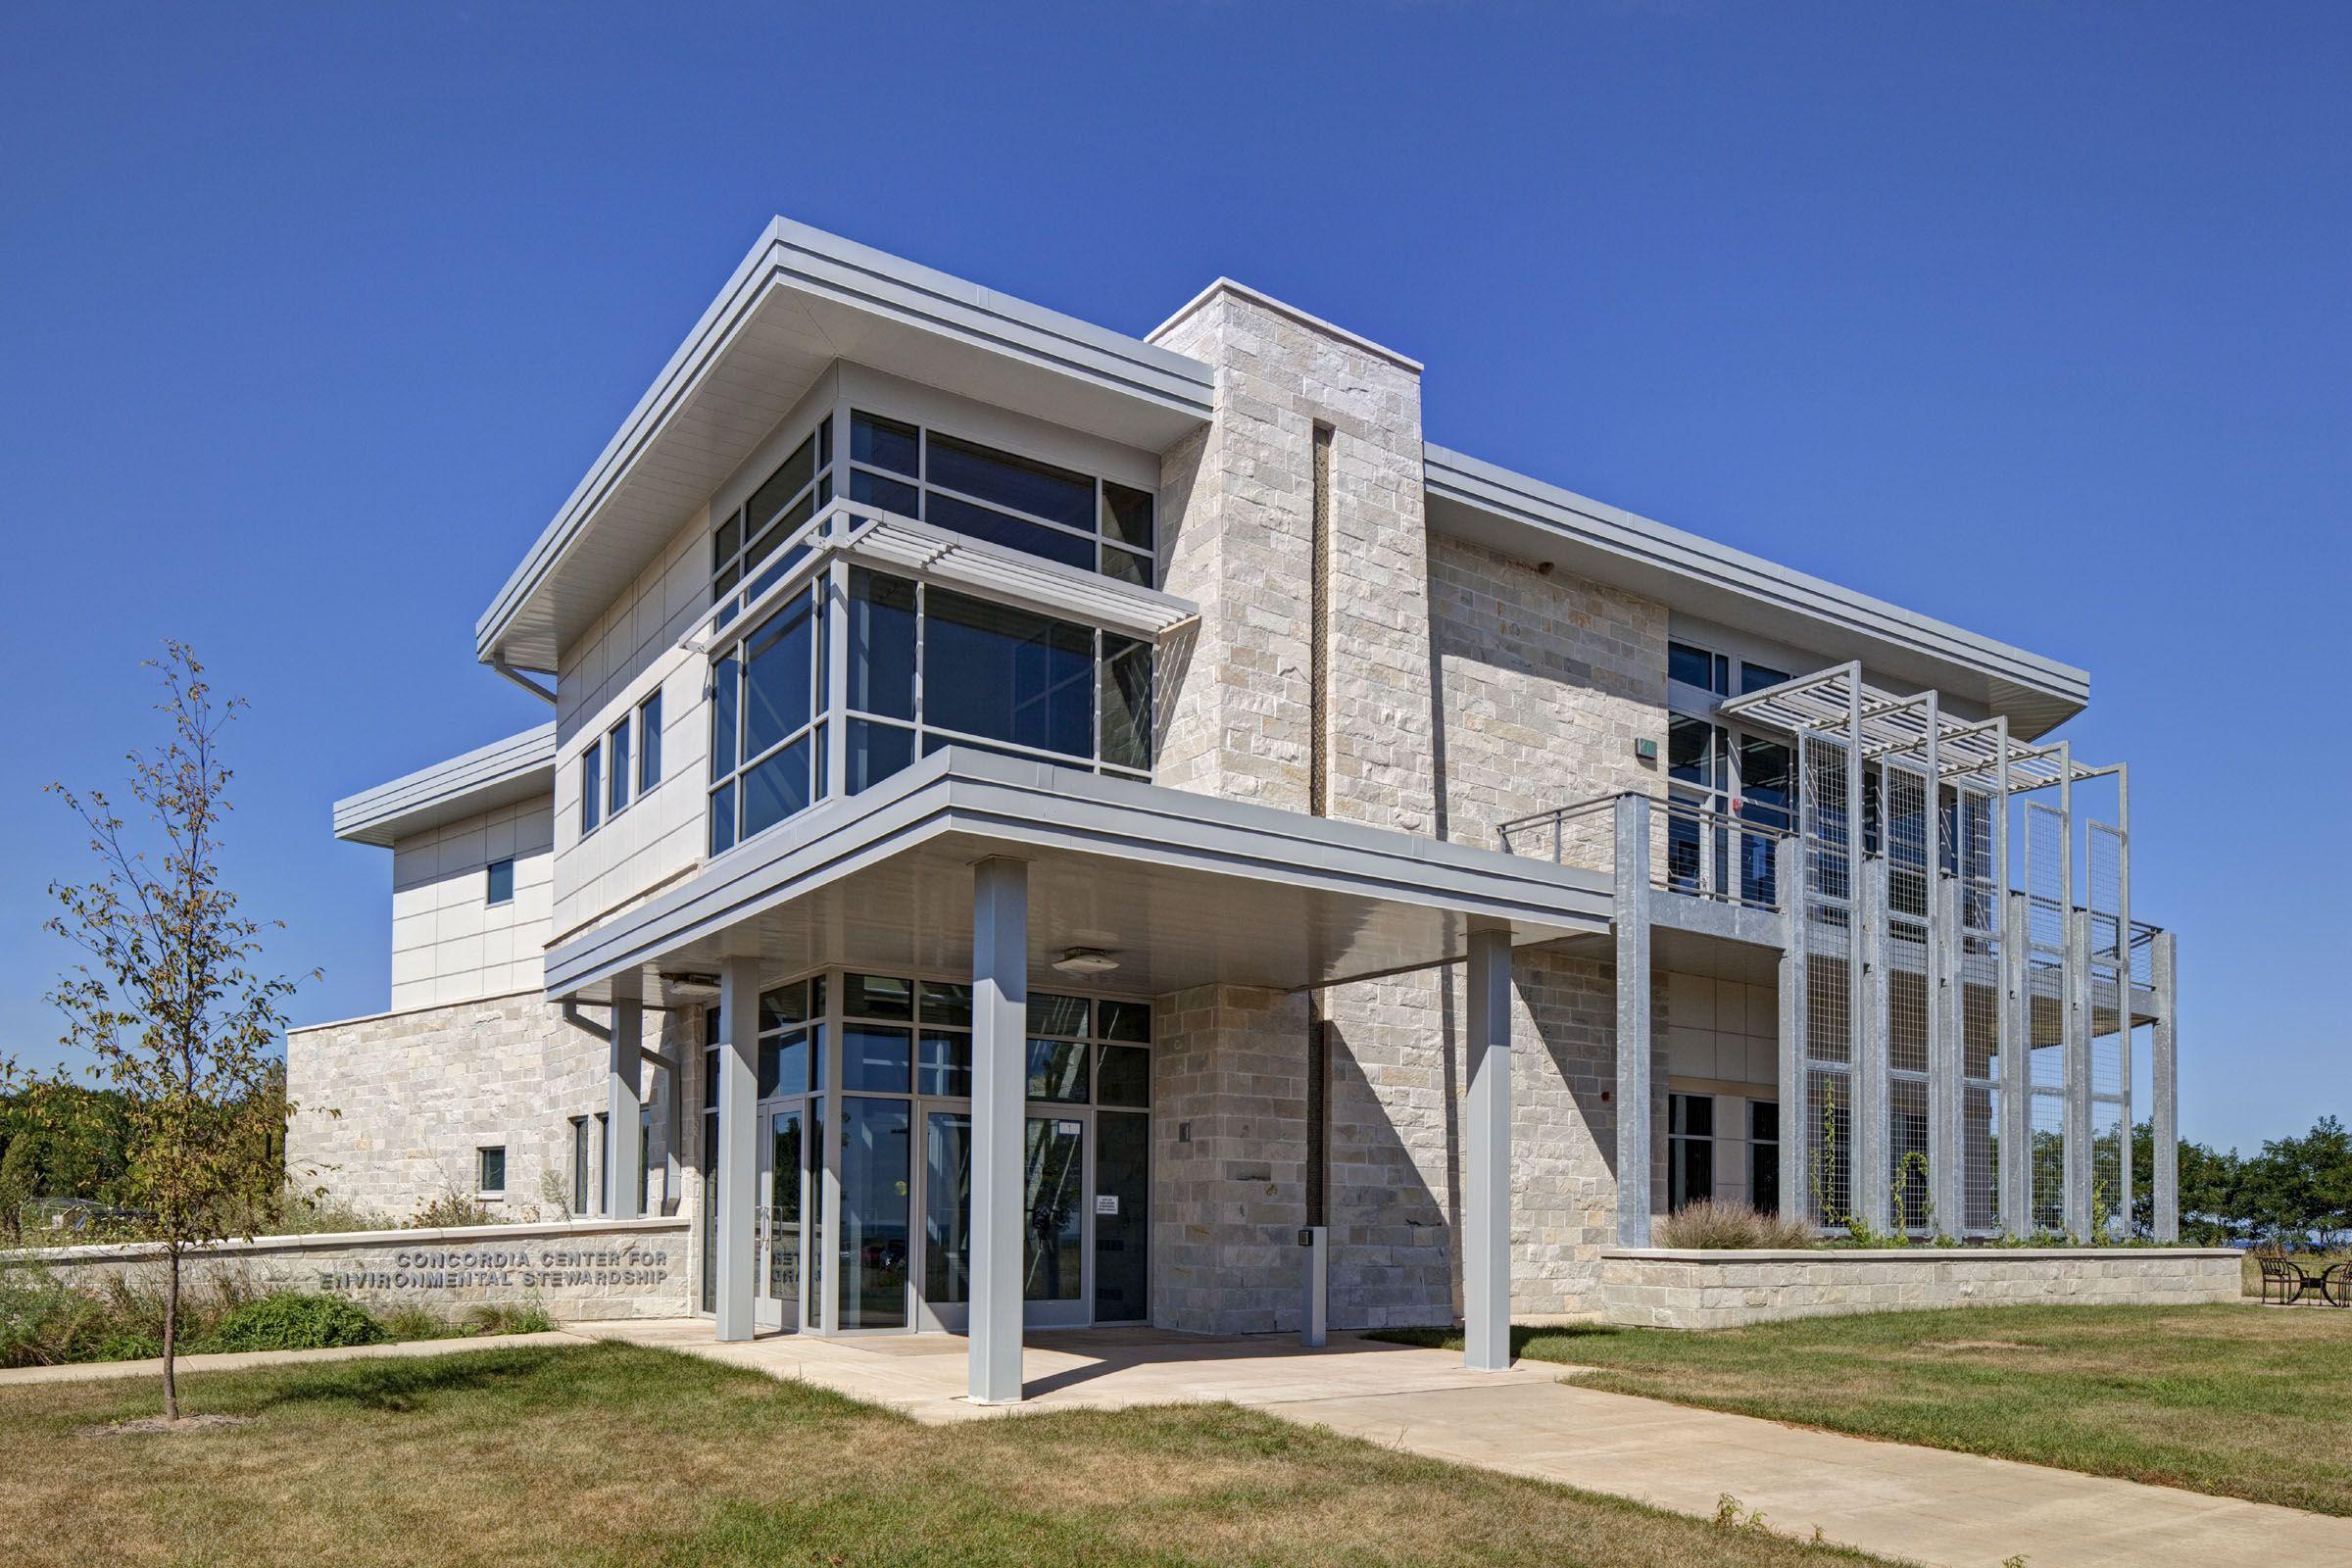 Concordia center for environmental stewardship